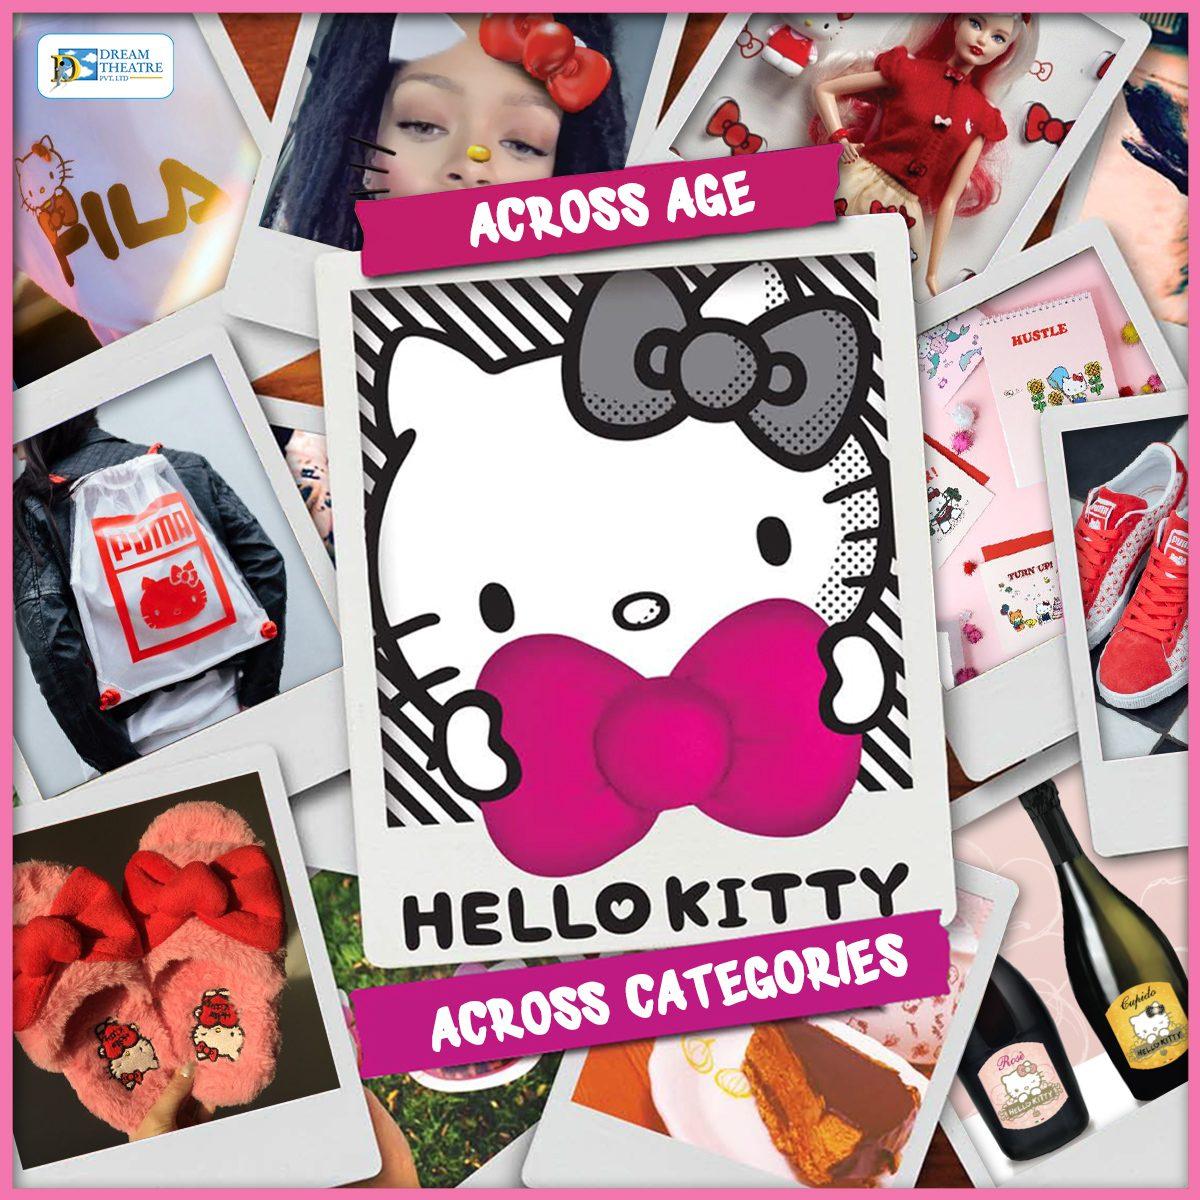 hello-kitty-across-age-across-categories